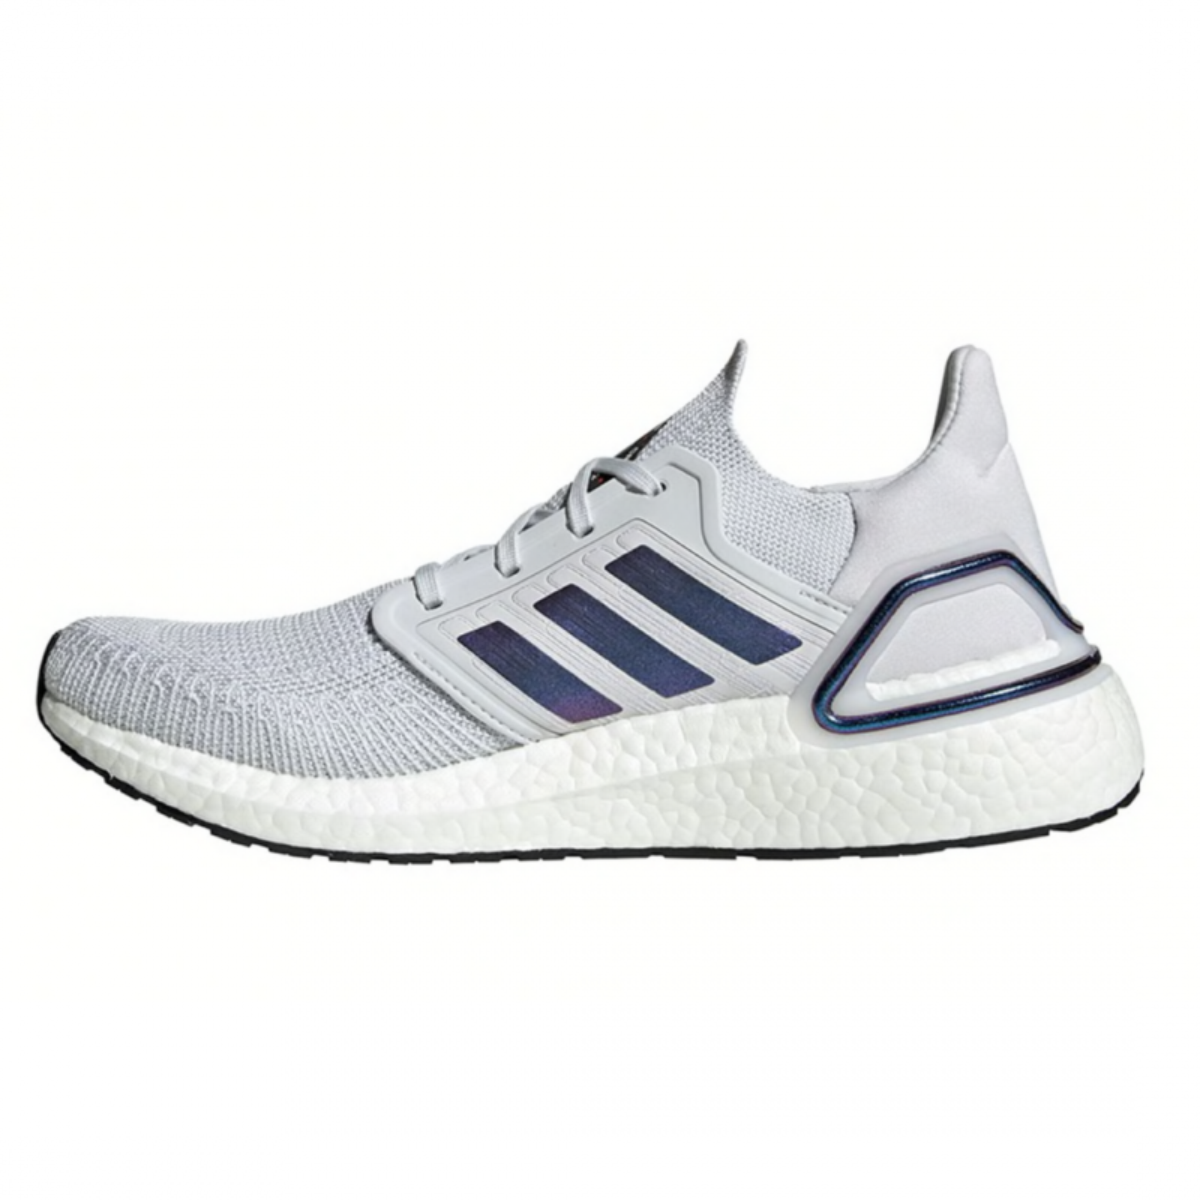 Zapatillas Adidas Ultra Boost 20 Gris Azul Púrpura Mujer PV20